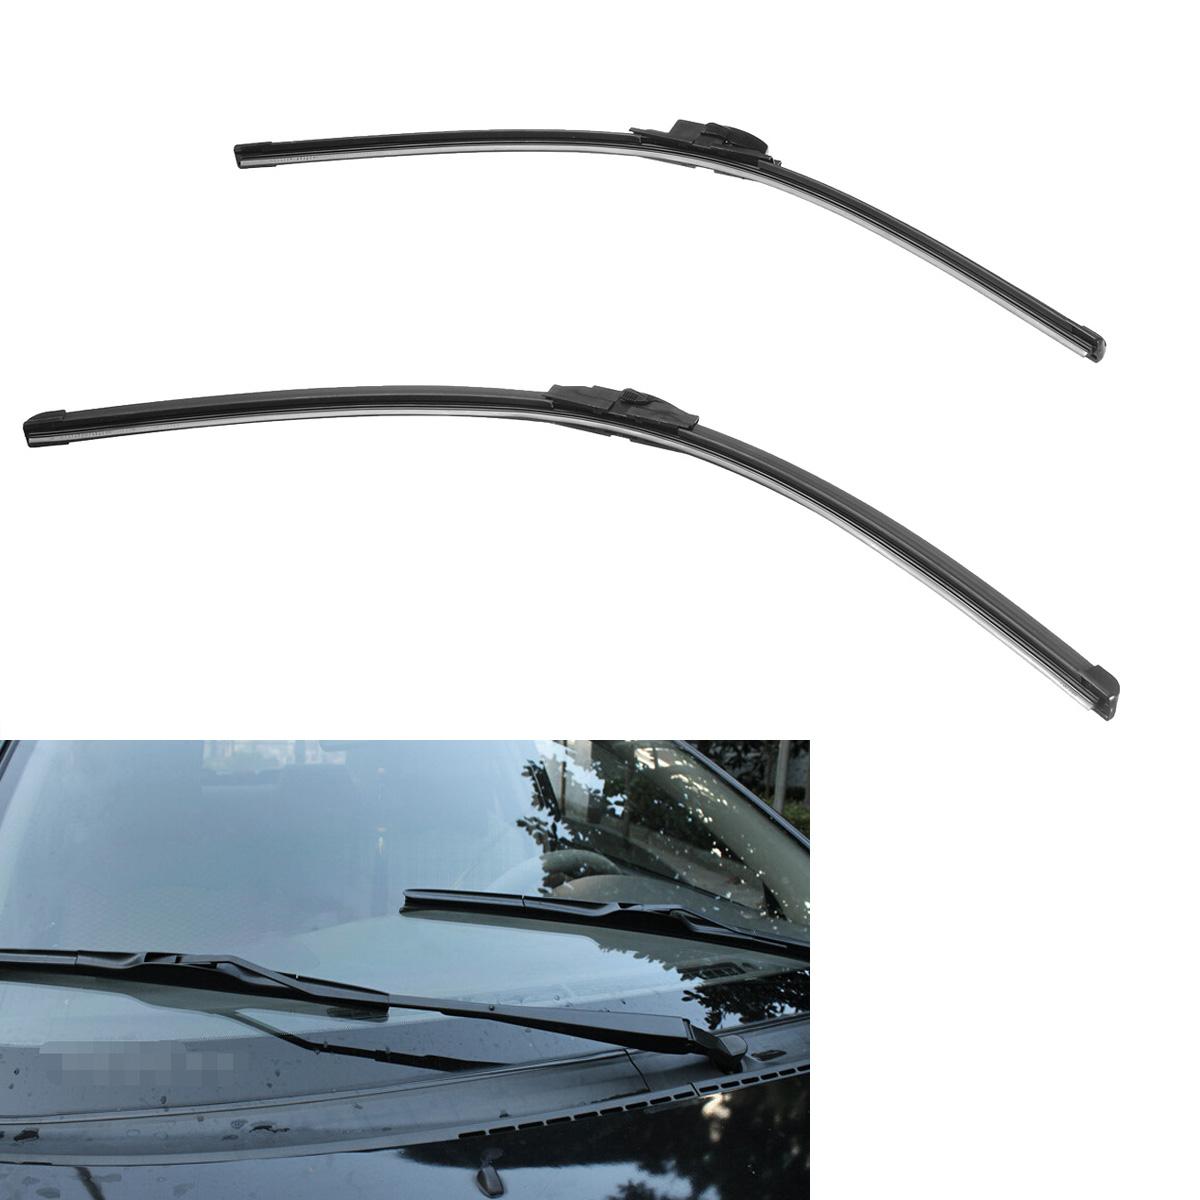 Superior Pair Front Window Windscreen Wiper Blades UK For Honda Civic 2006 2011 28u0027u0027  23u0027u0027 | EBay